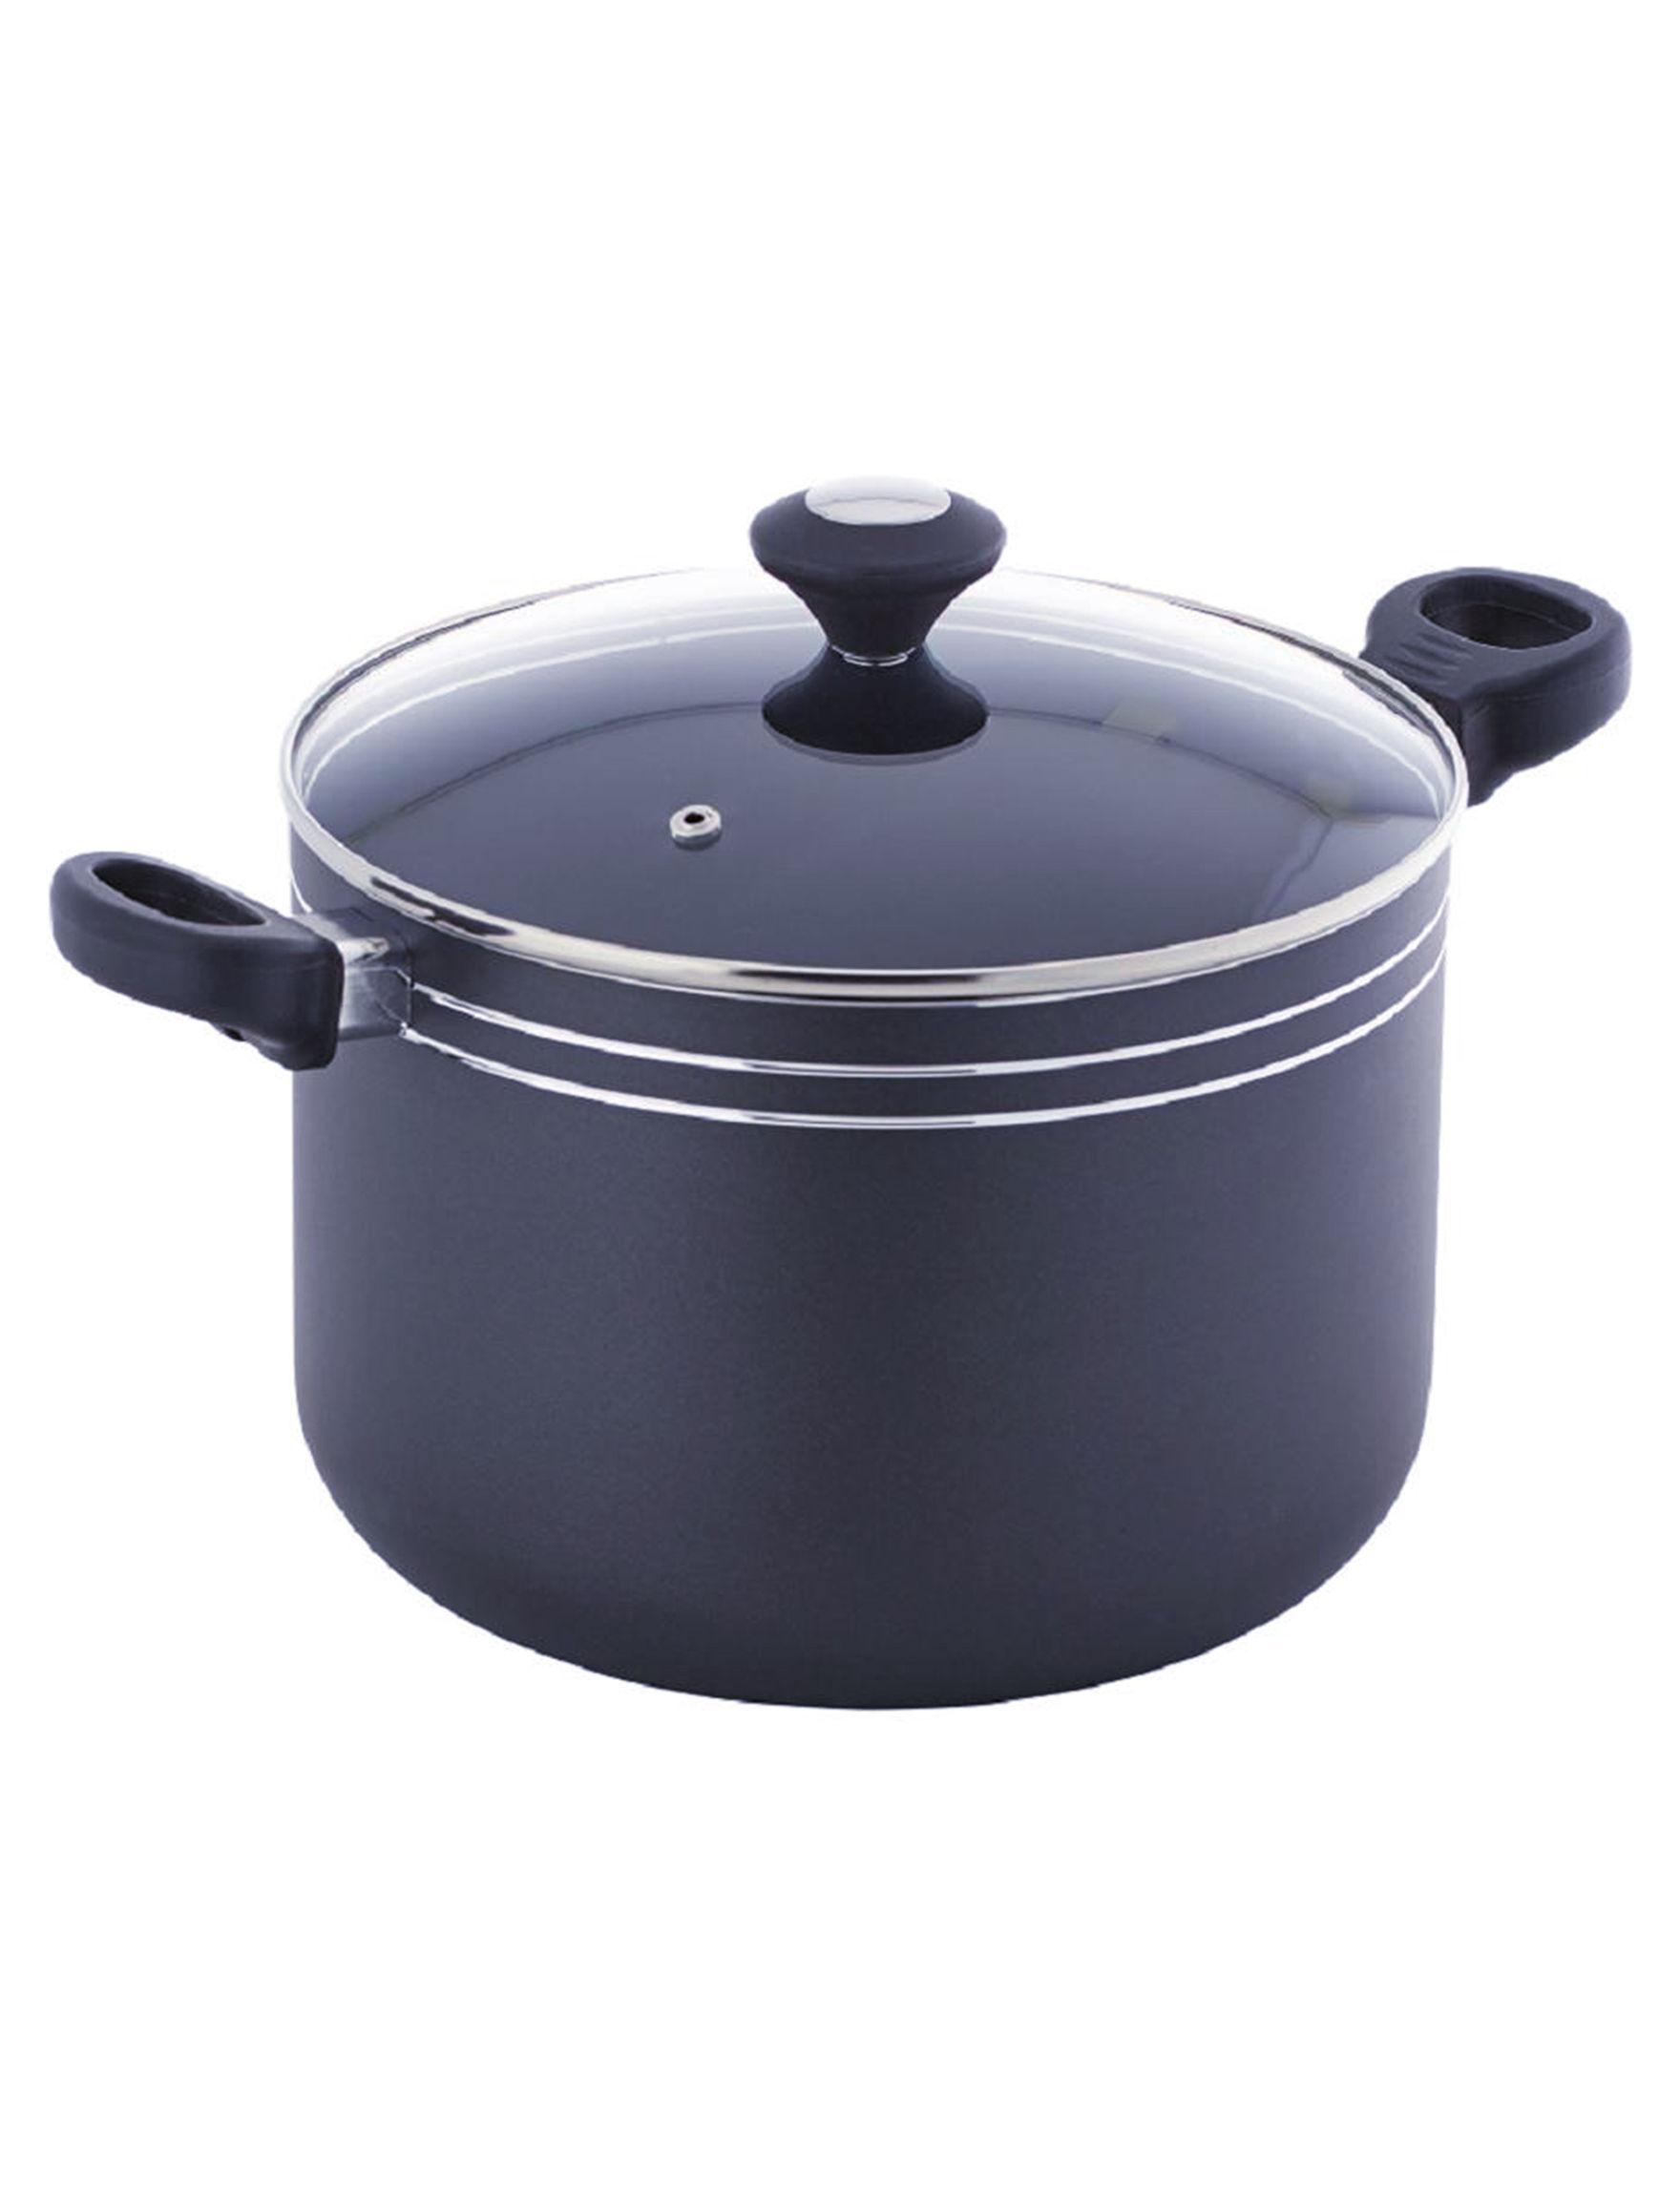 Smart Living Black Pots & Dutch Ovens Cookware